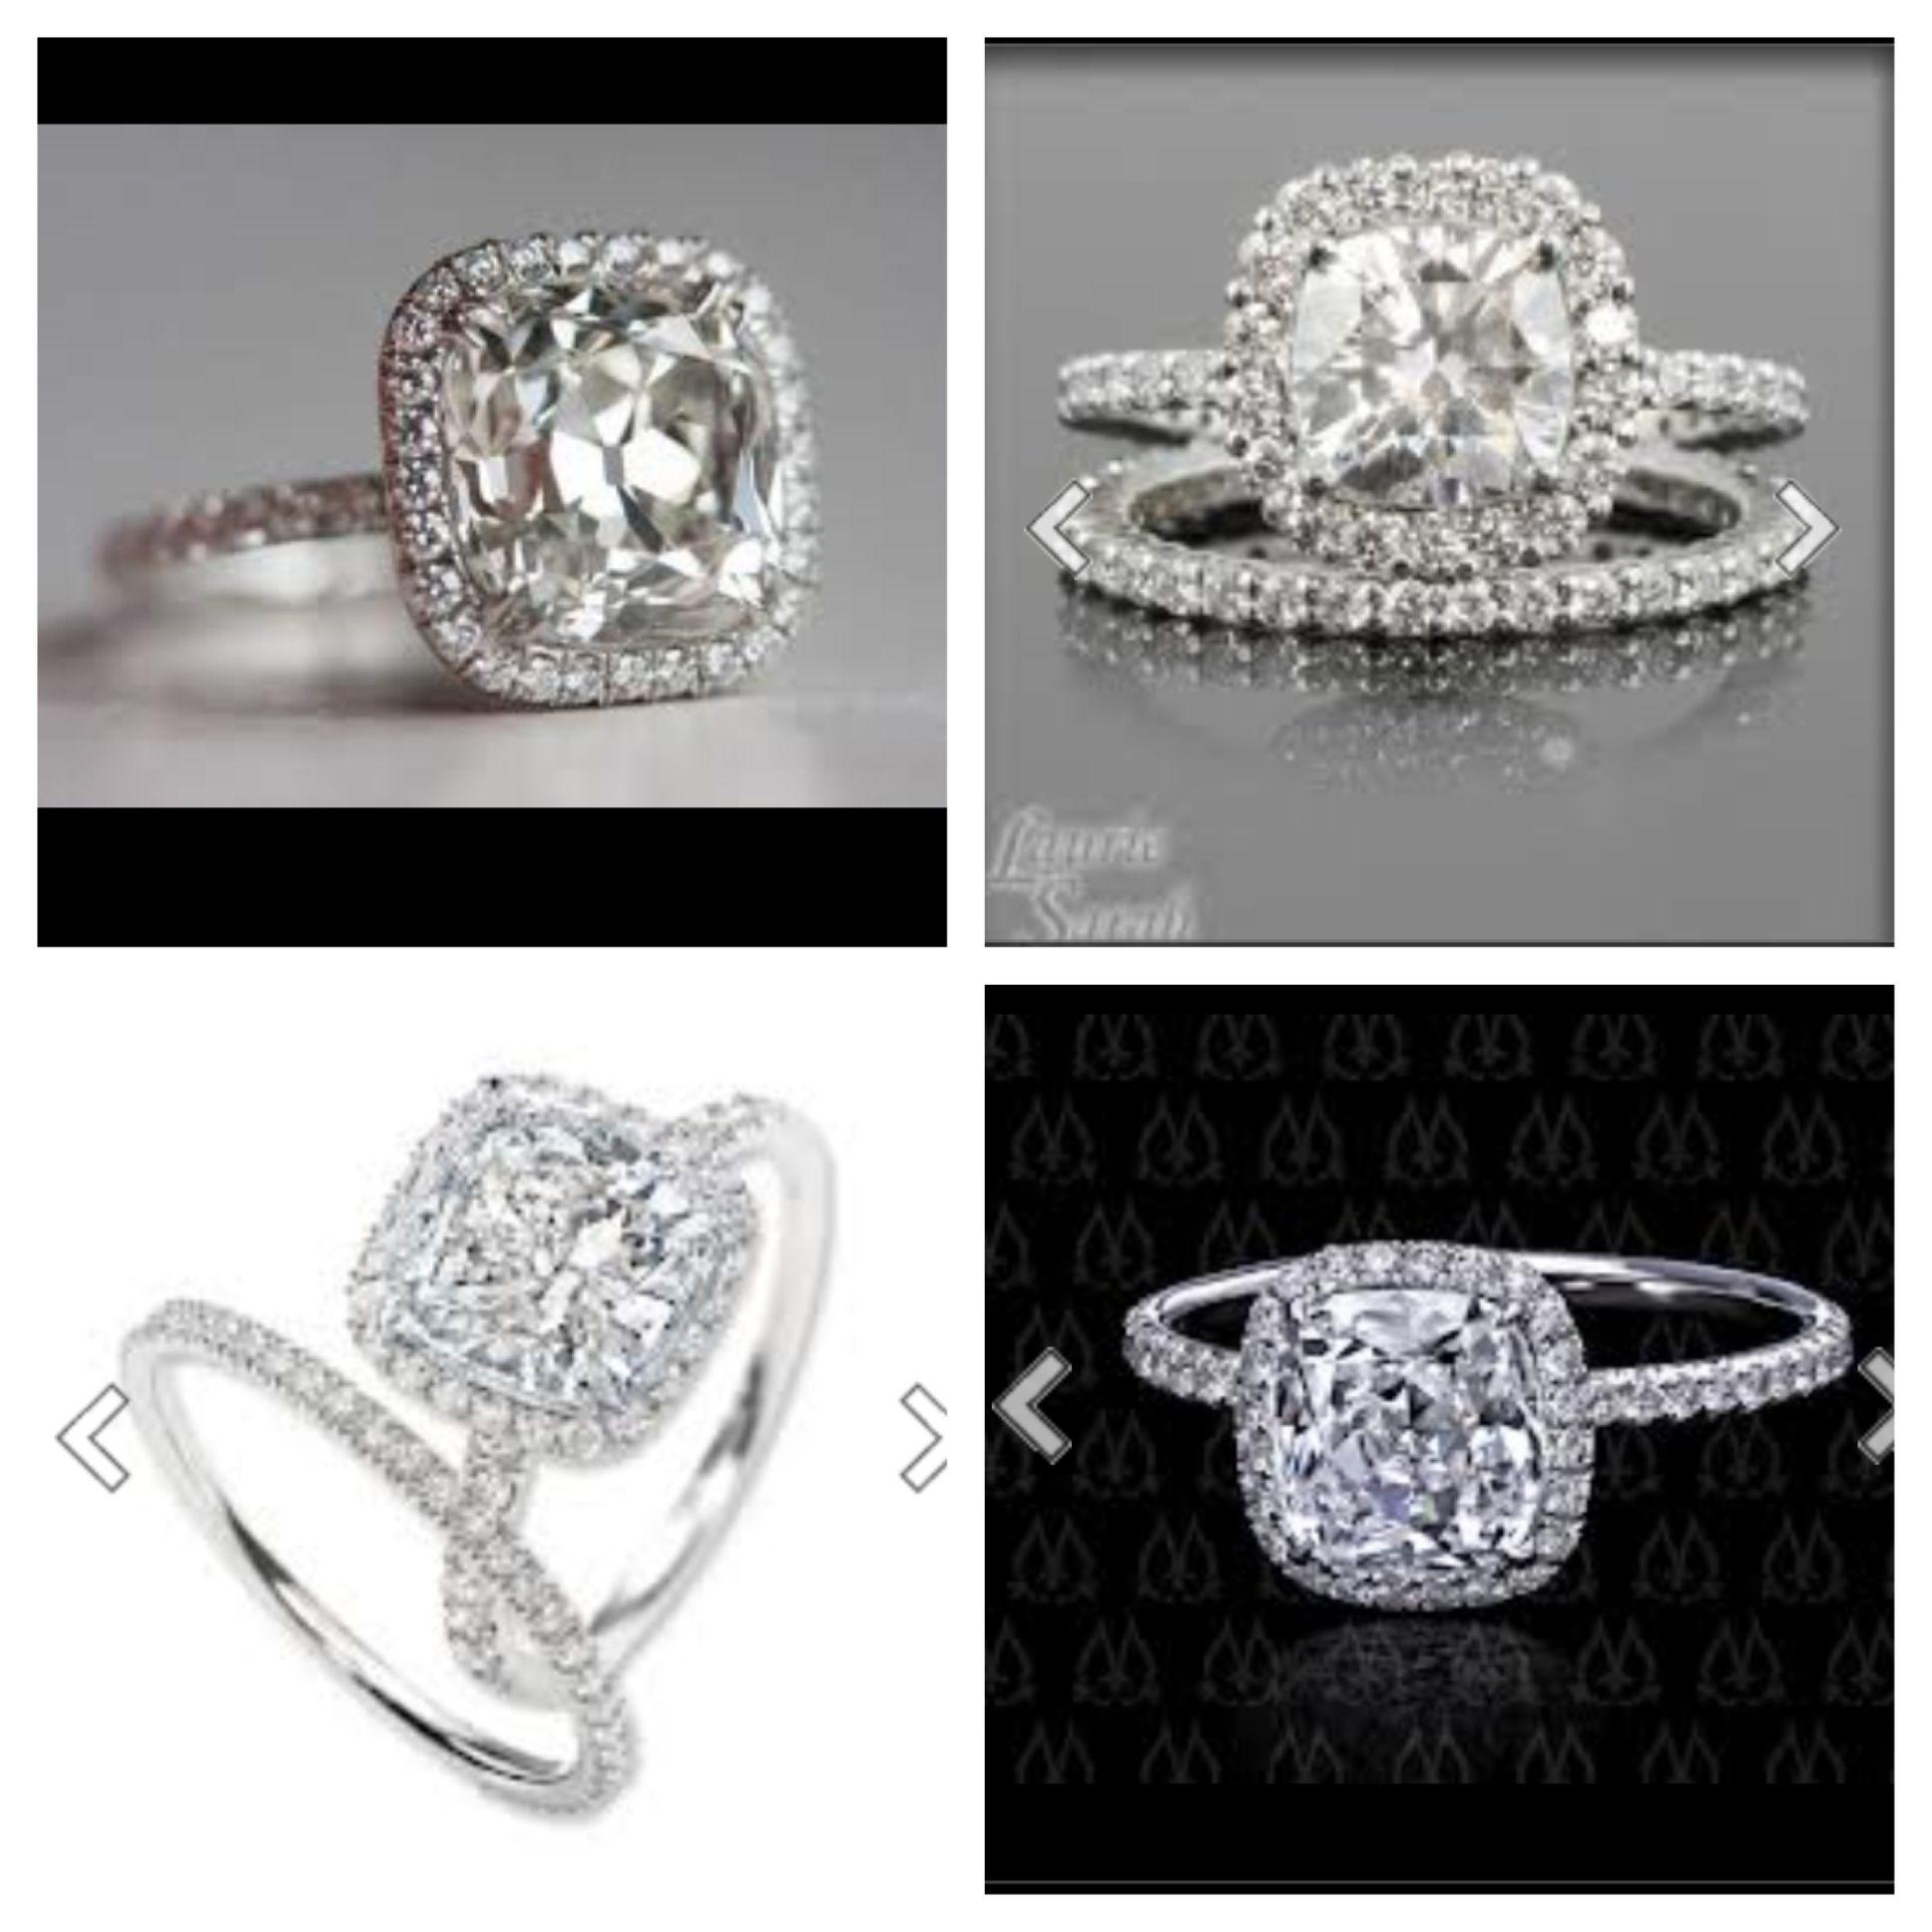 Cushion cut or round cut diamond in a cushion halo setting with a